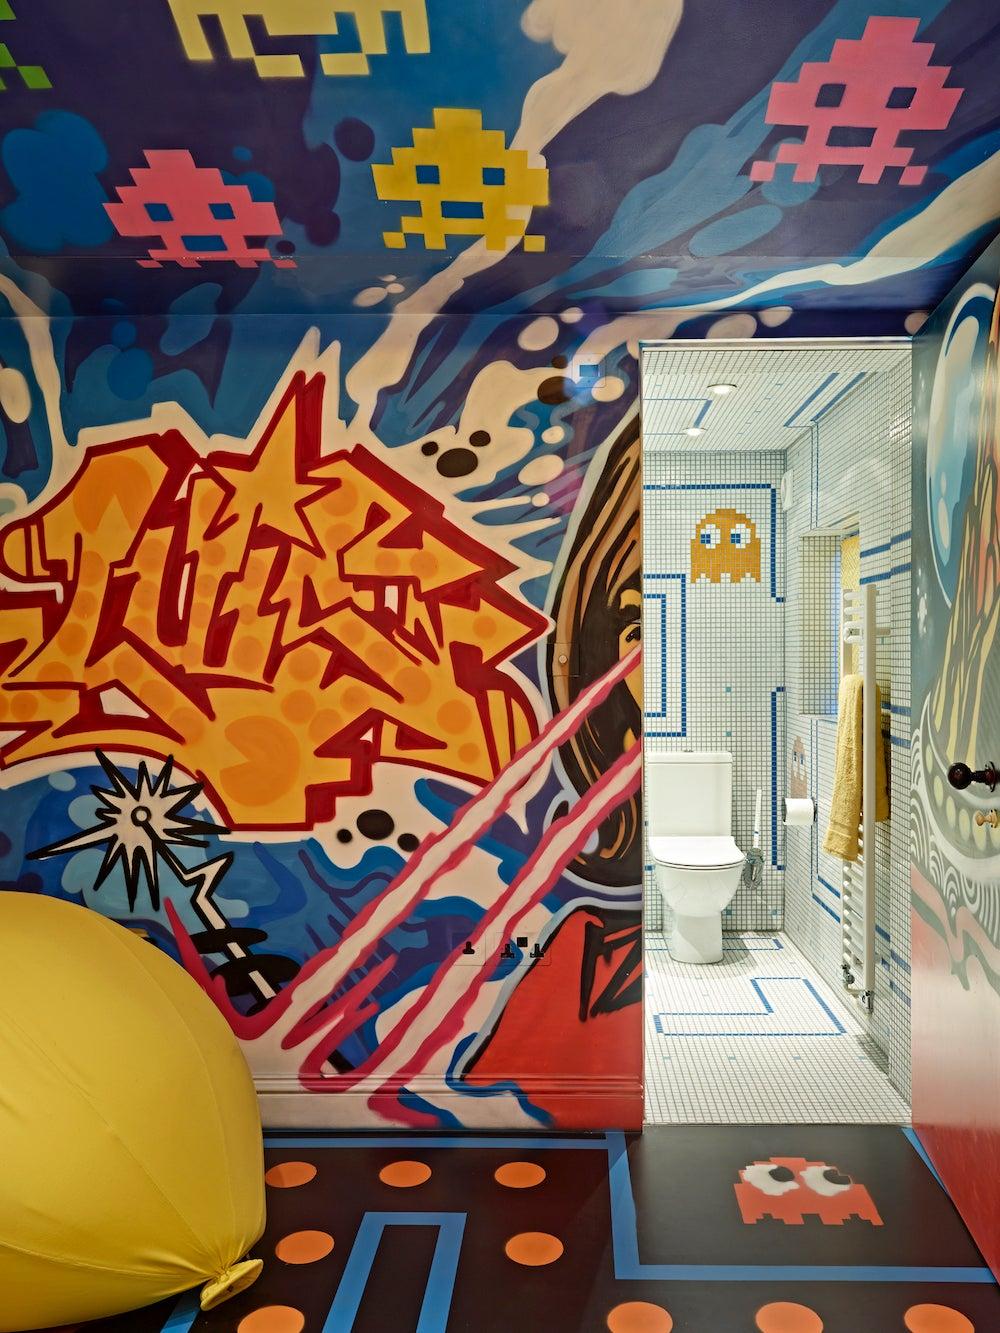 graffiti game room walls